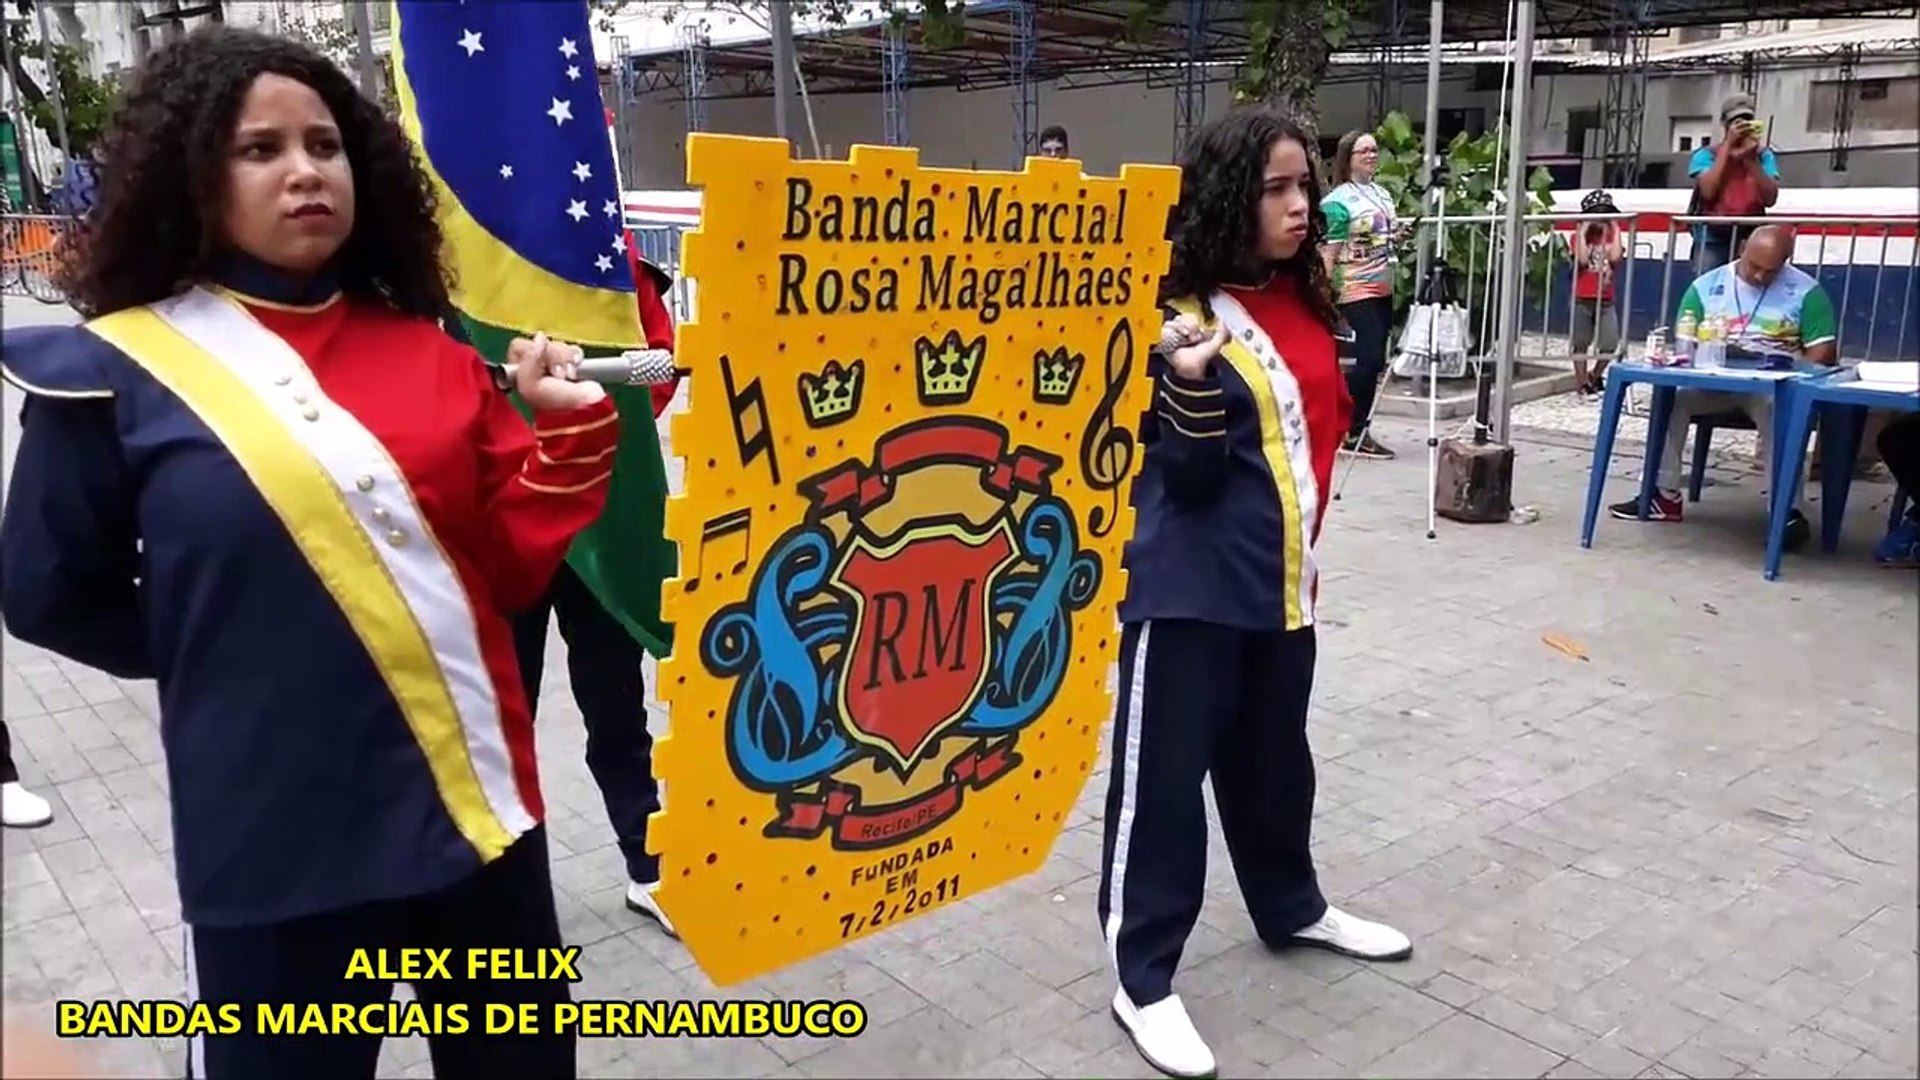 CNBF - 2018 _ Banda Marcial da E.E. Rosa Magalhaes de Melo _ CAMPEONATO NACIONAL DE BANDAS